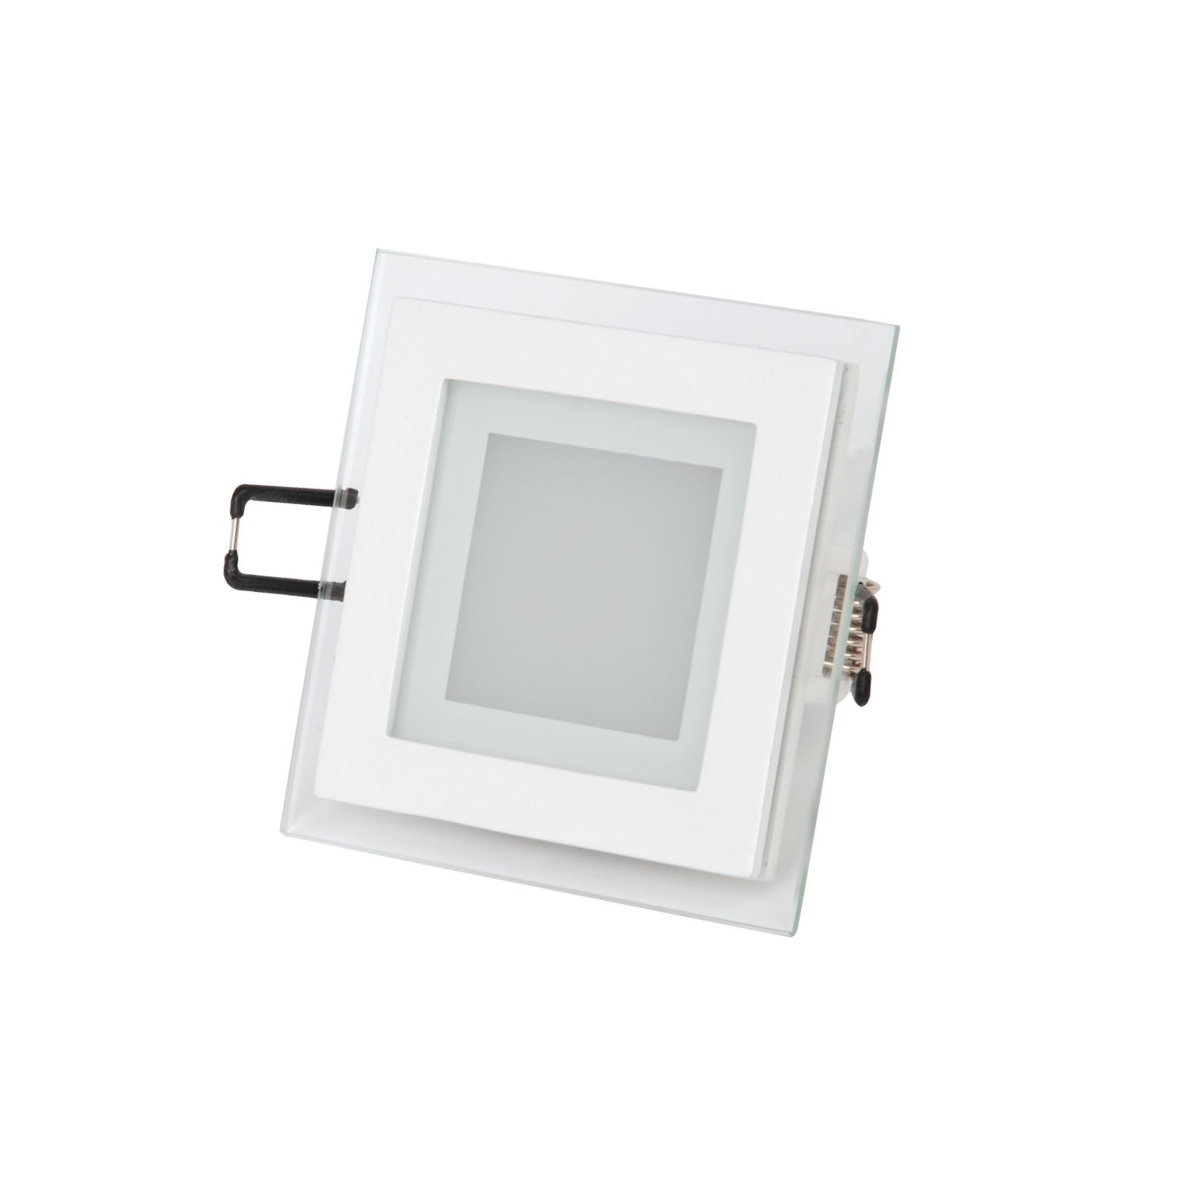 led aluminium einbaustrahler kristallglas mit trafo 230v 6w 12w 15w bis 1200lm ebay. Black Bedroom Furniture Sets. Home Design Ideas